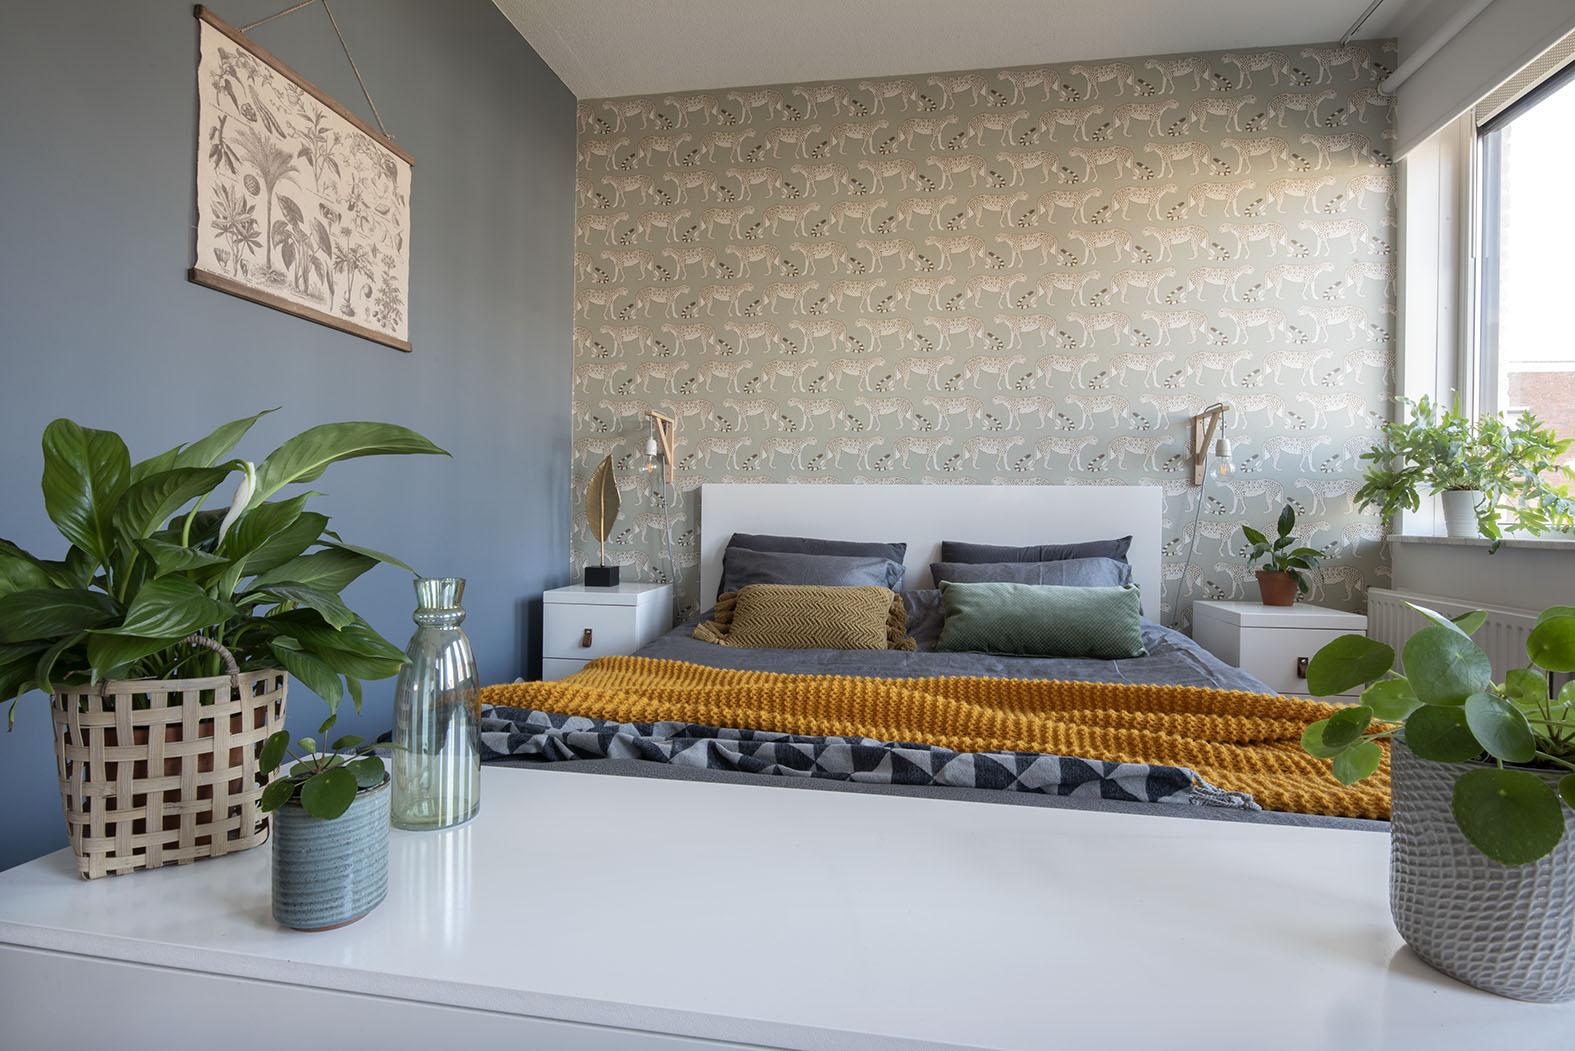 Slaapkamer-interieur-ontwerp-blauw-luipaard-styling-groen-7